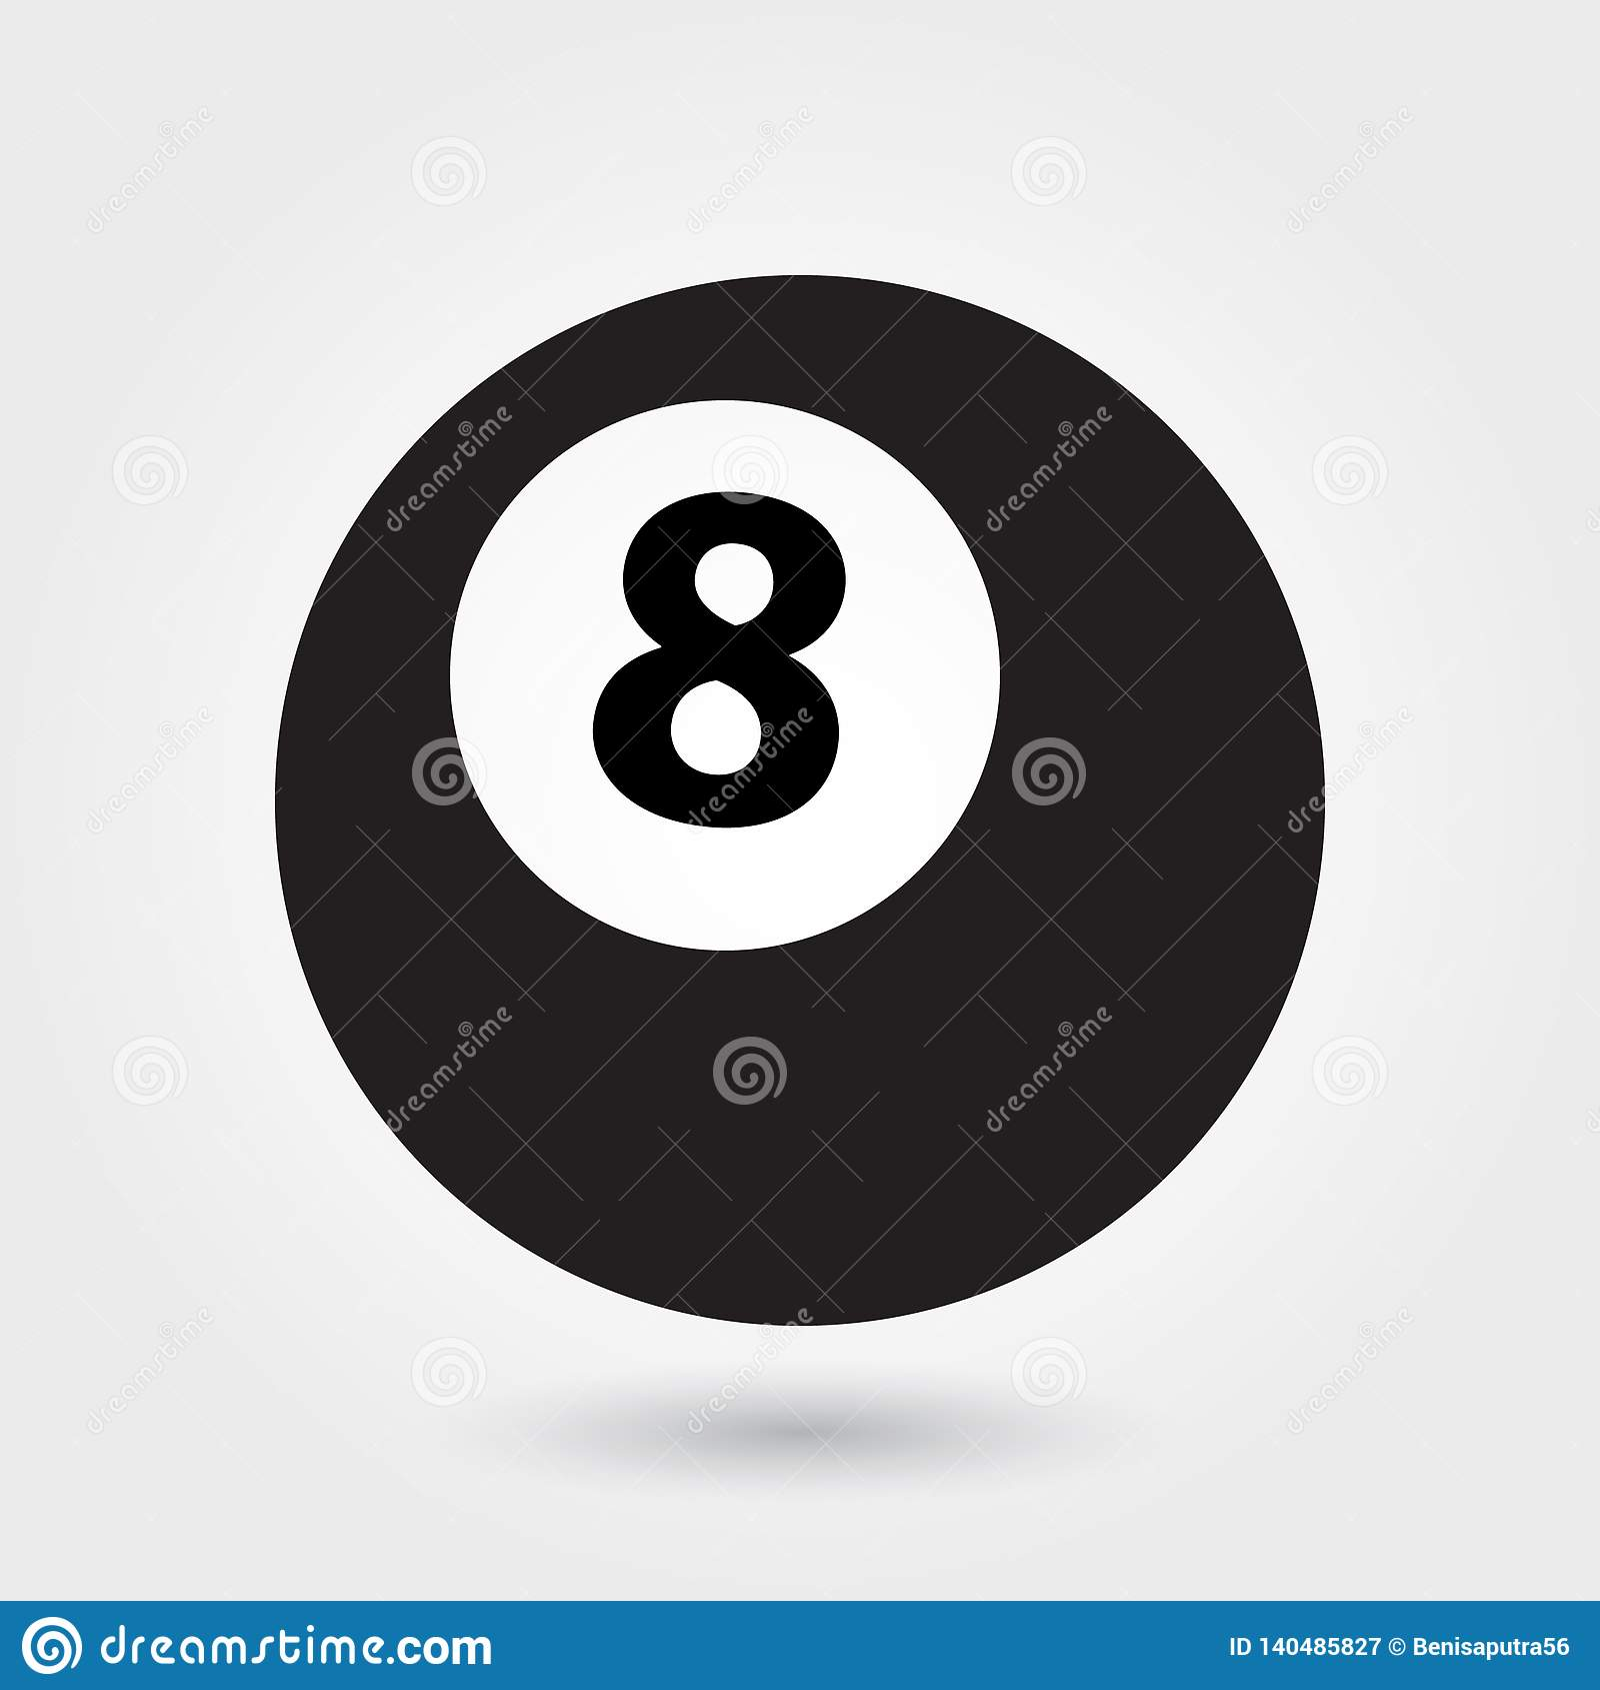 Billardvektorikone, Ikone mit 8 Bällen, Sportballsymbol Moderner, einfacher Glyph, feste Vektorillustration